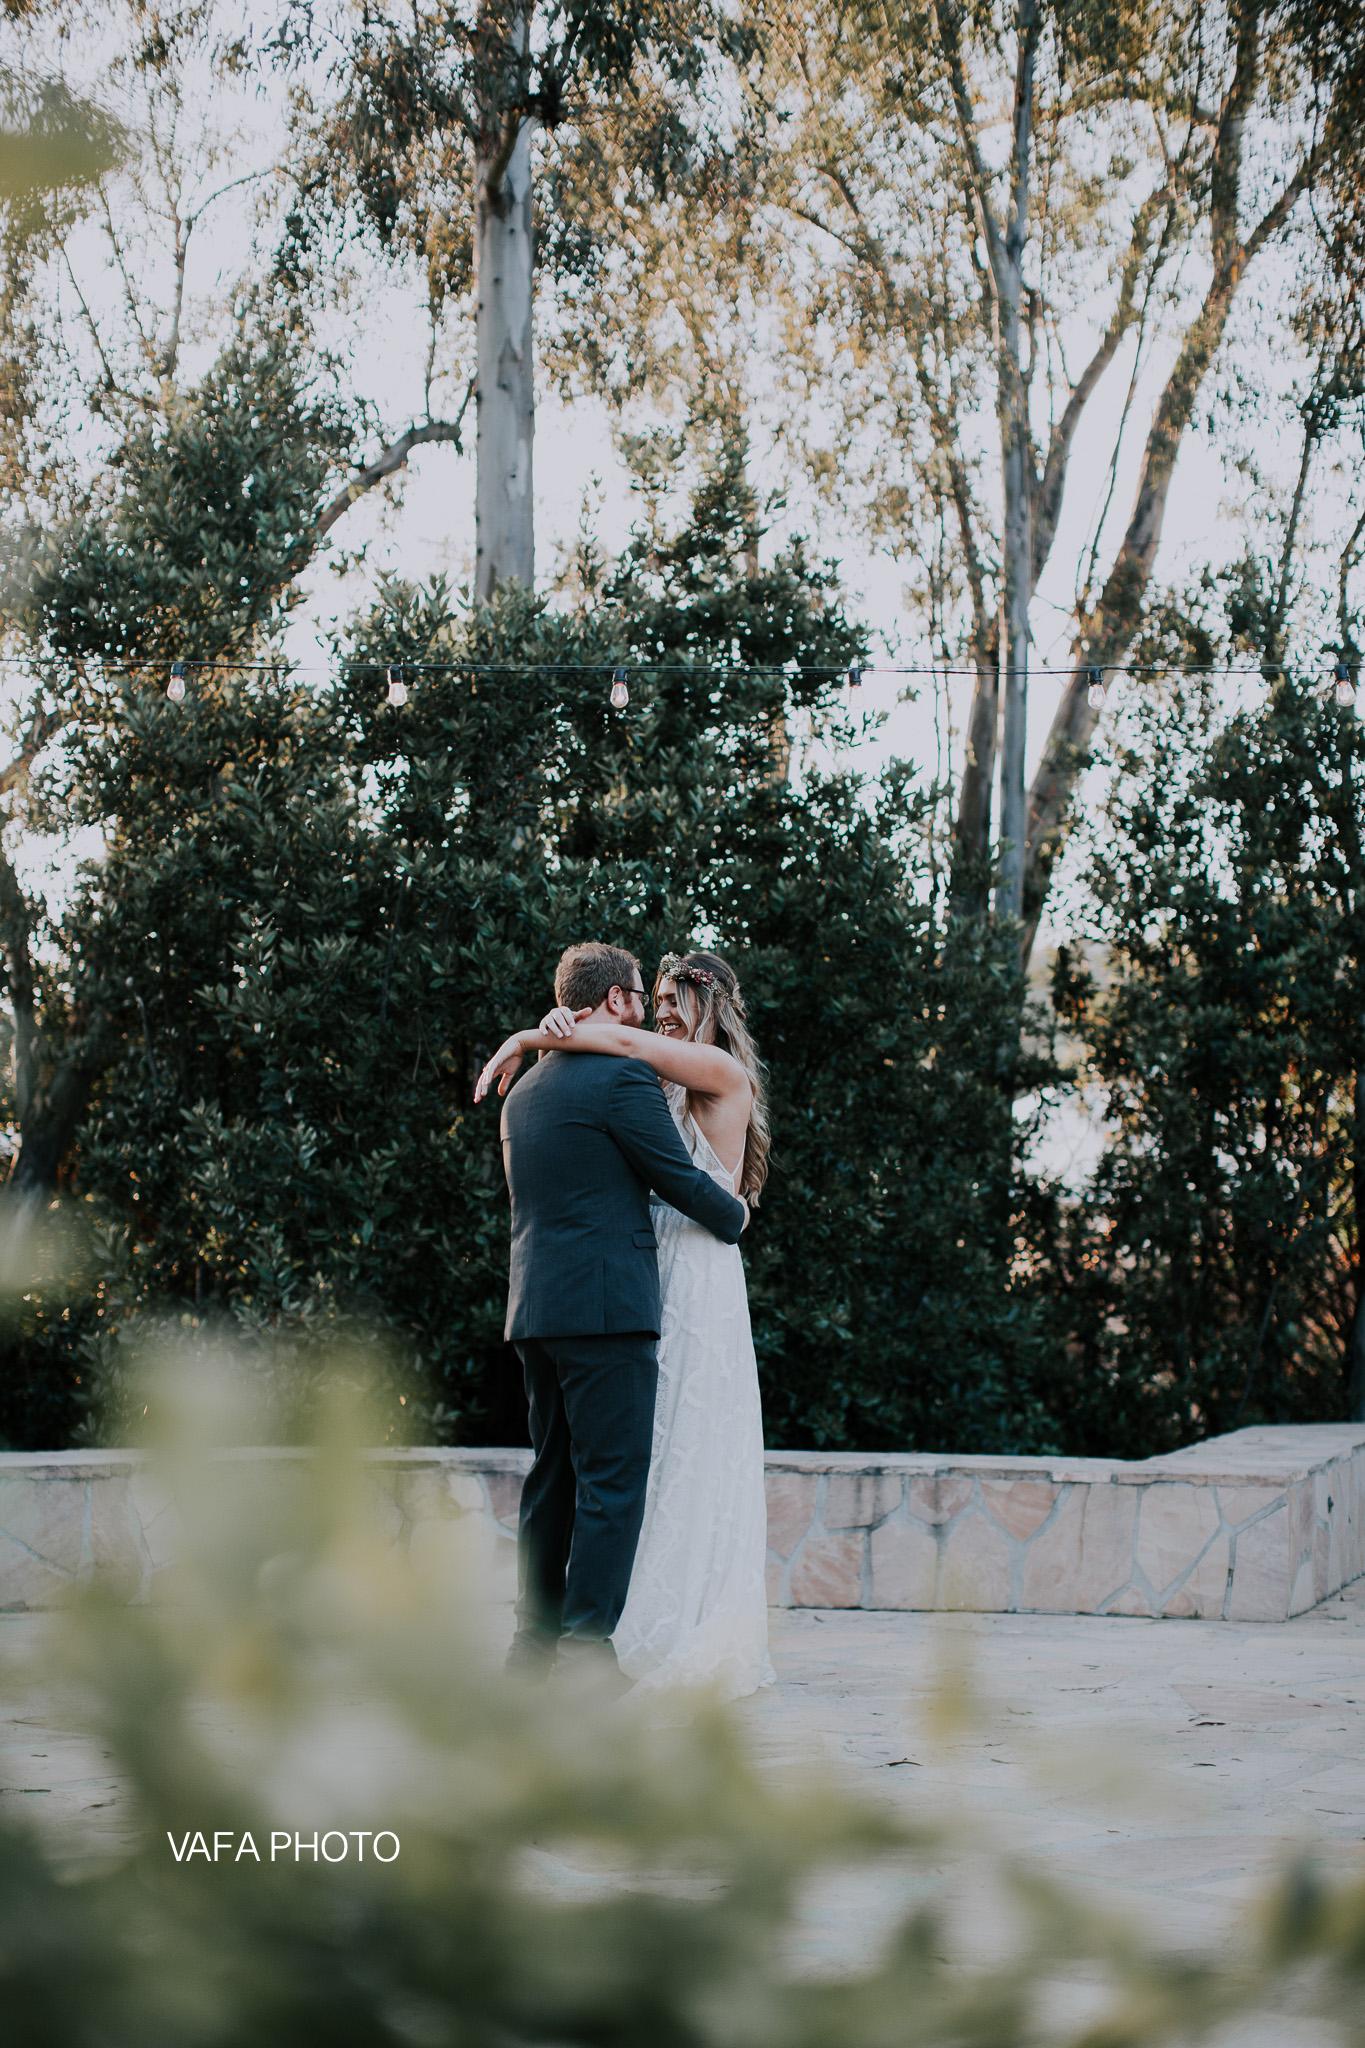 Leo-Carrillo-Ranch-Wedding-Lauren-Mike-Vafa-Photo-905.jpg